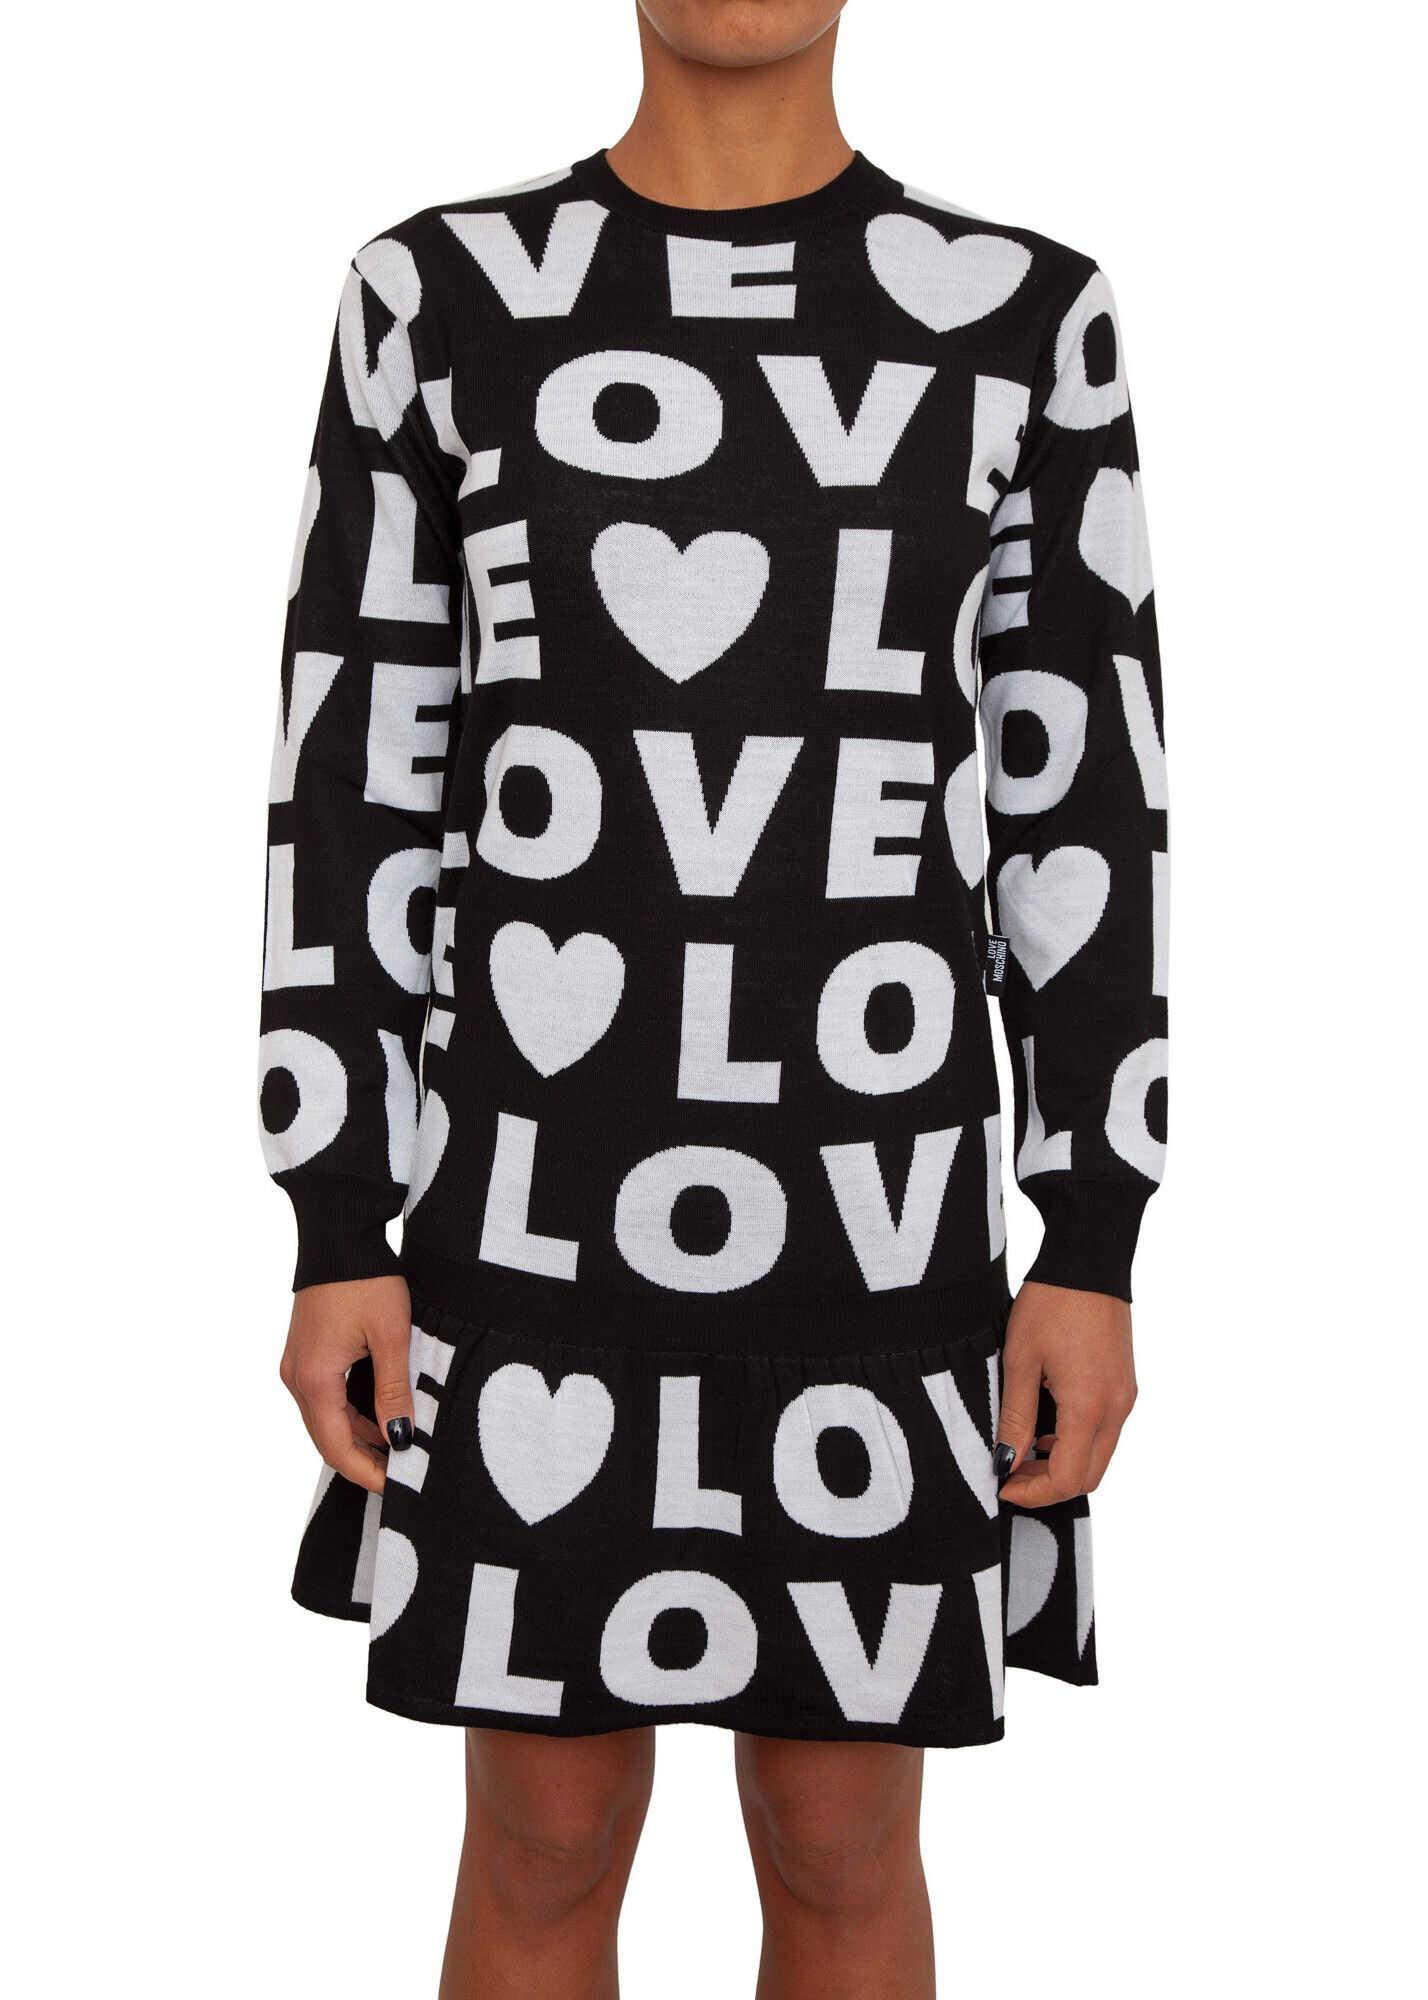 LOVE Moschino 670D8B6D FANTASY